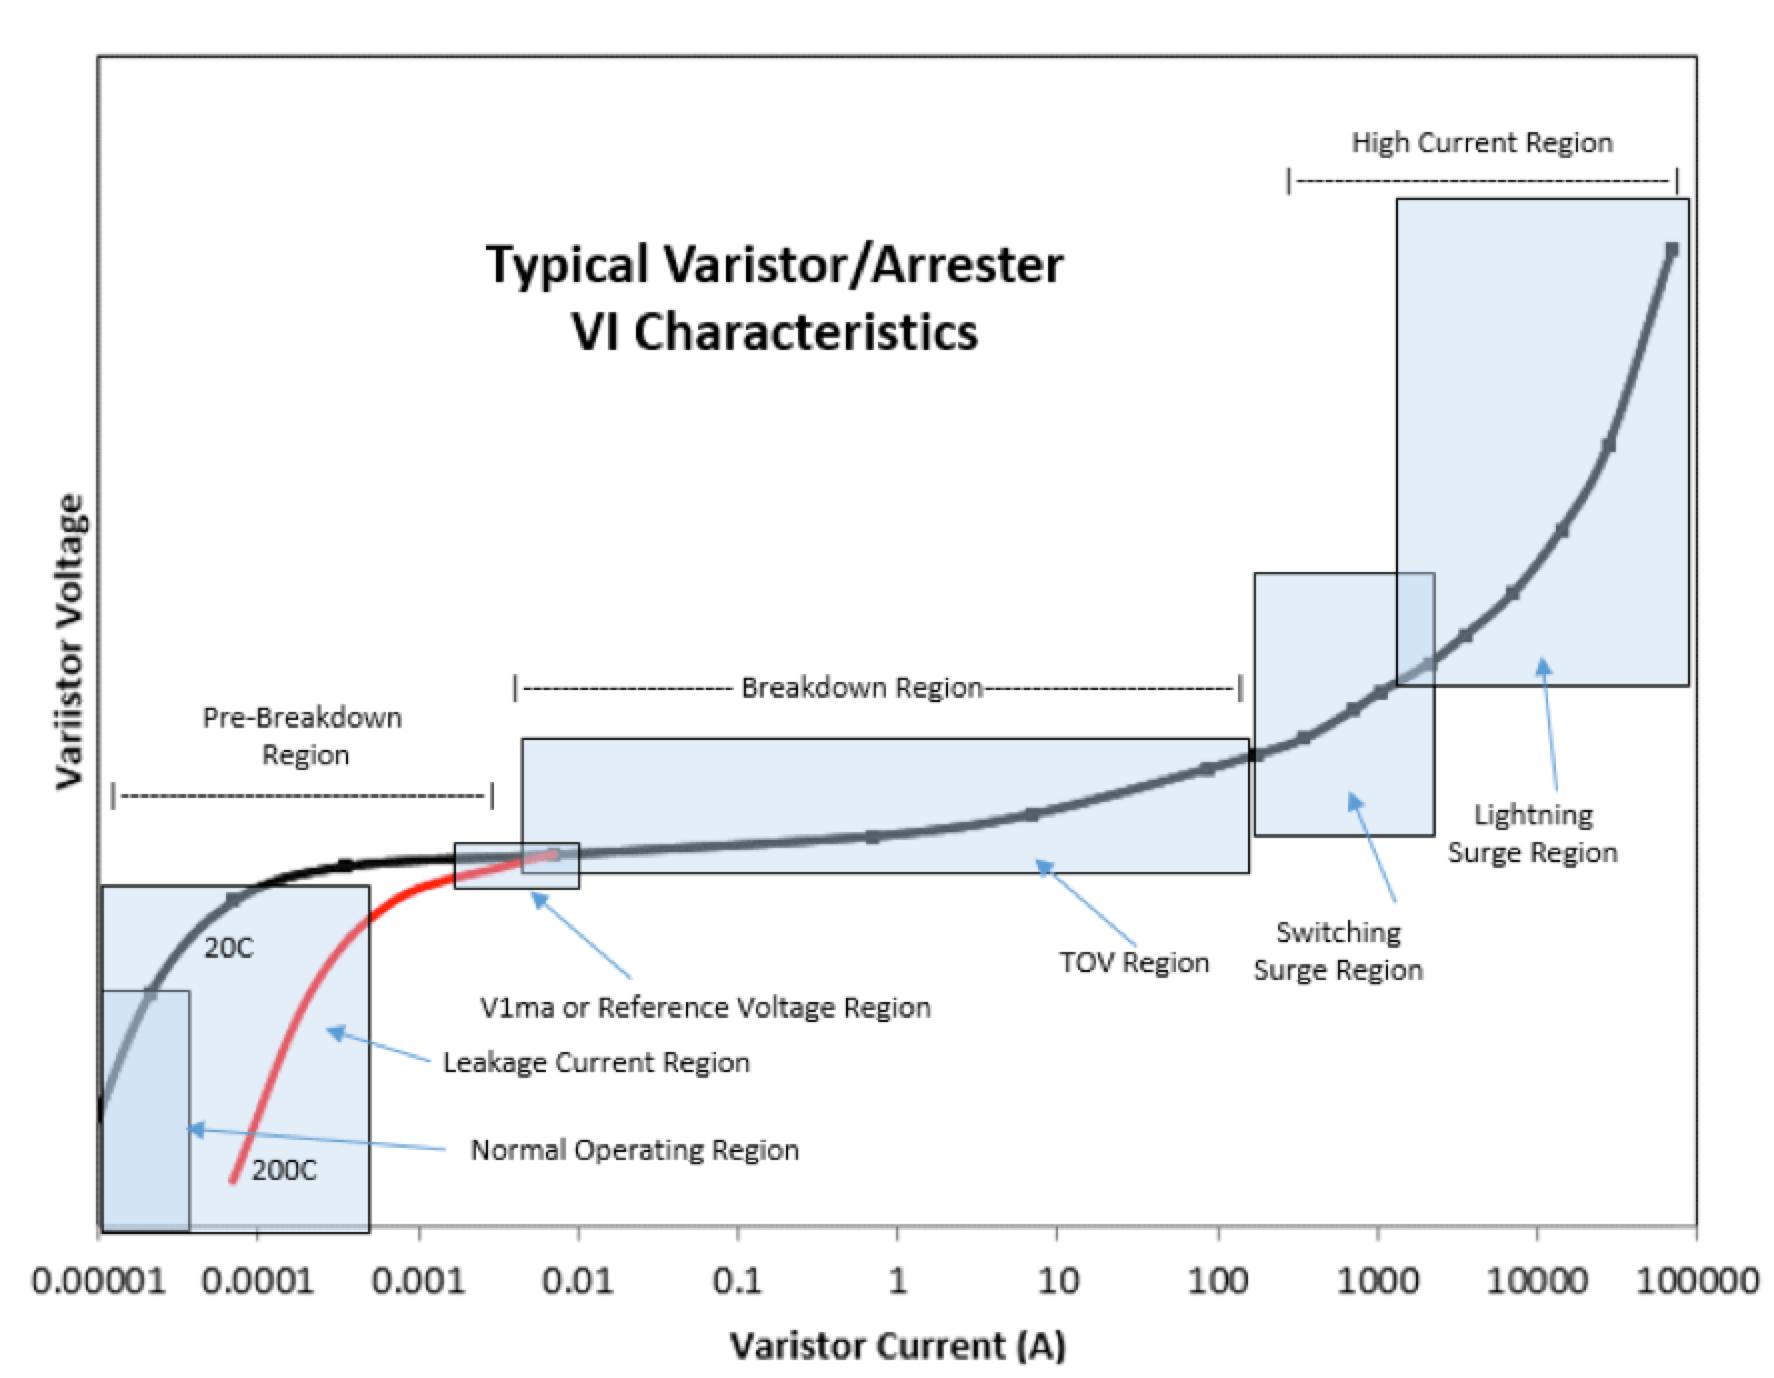 Understanding Arrester V I Characteristic Curves arrester Understanding Arrester VI Characteristic Curves Screen Shot 2016 07 29 at 12